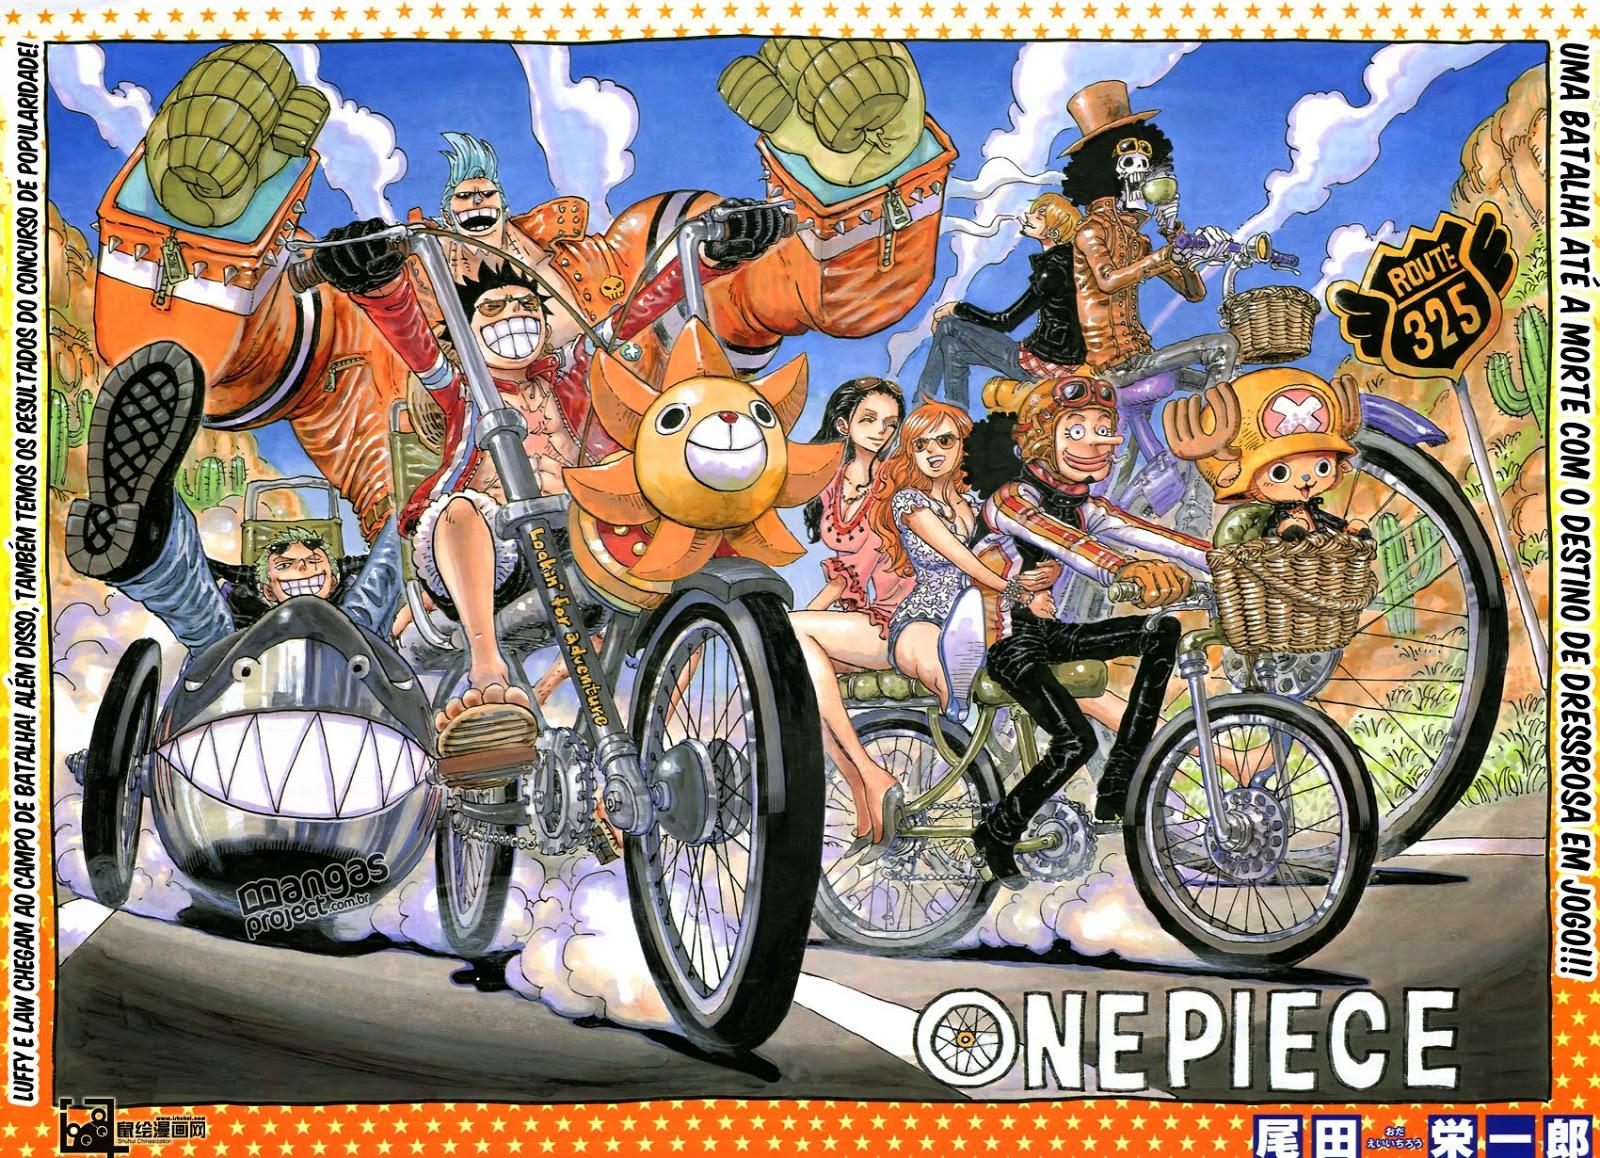 One Piece 775 Mangá Português leitura online